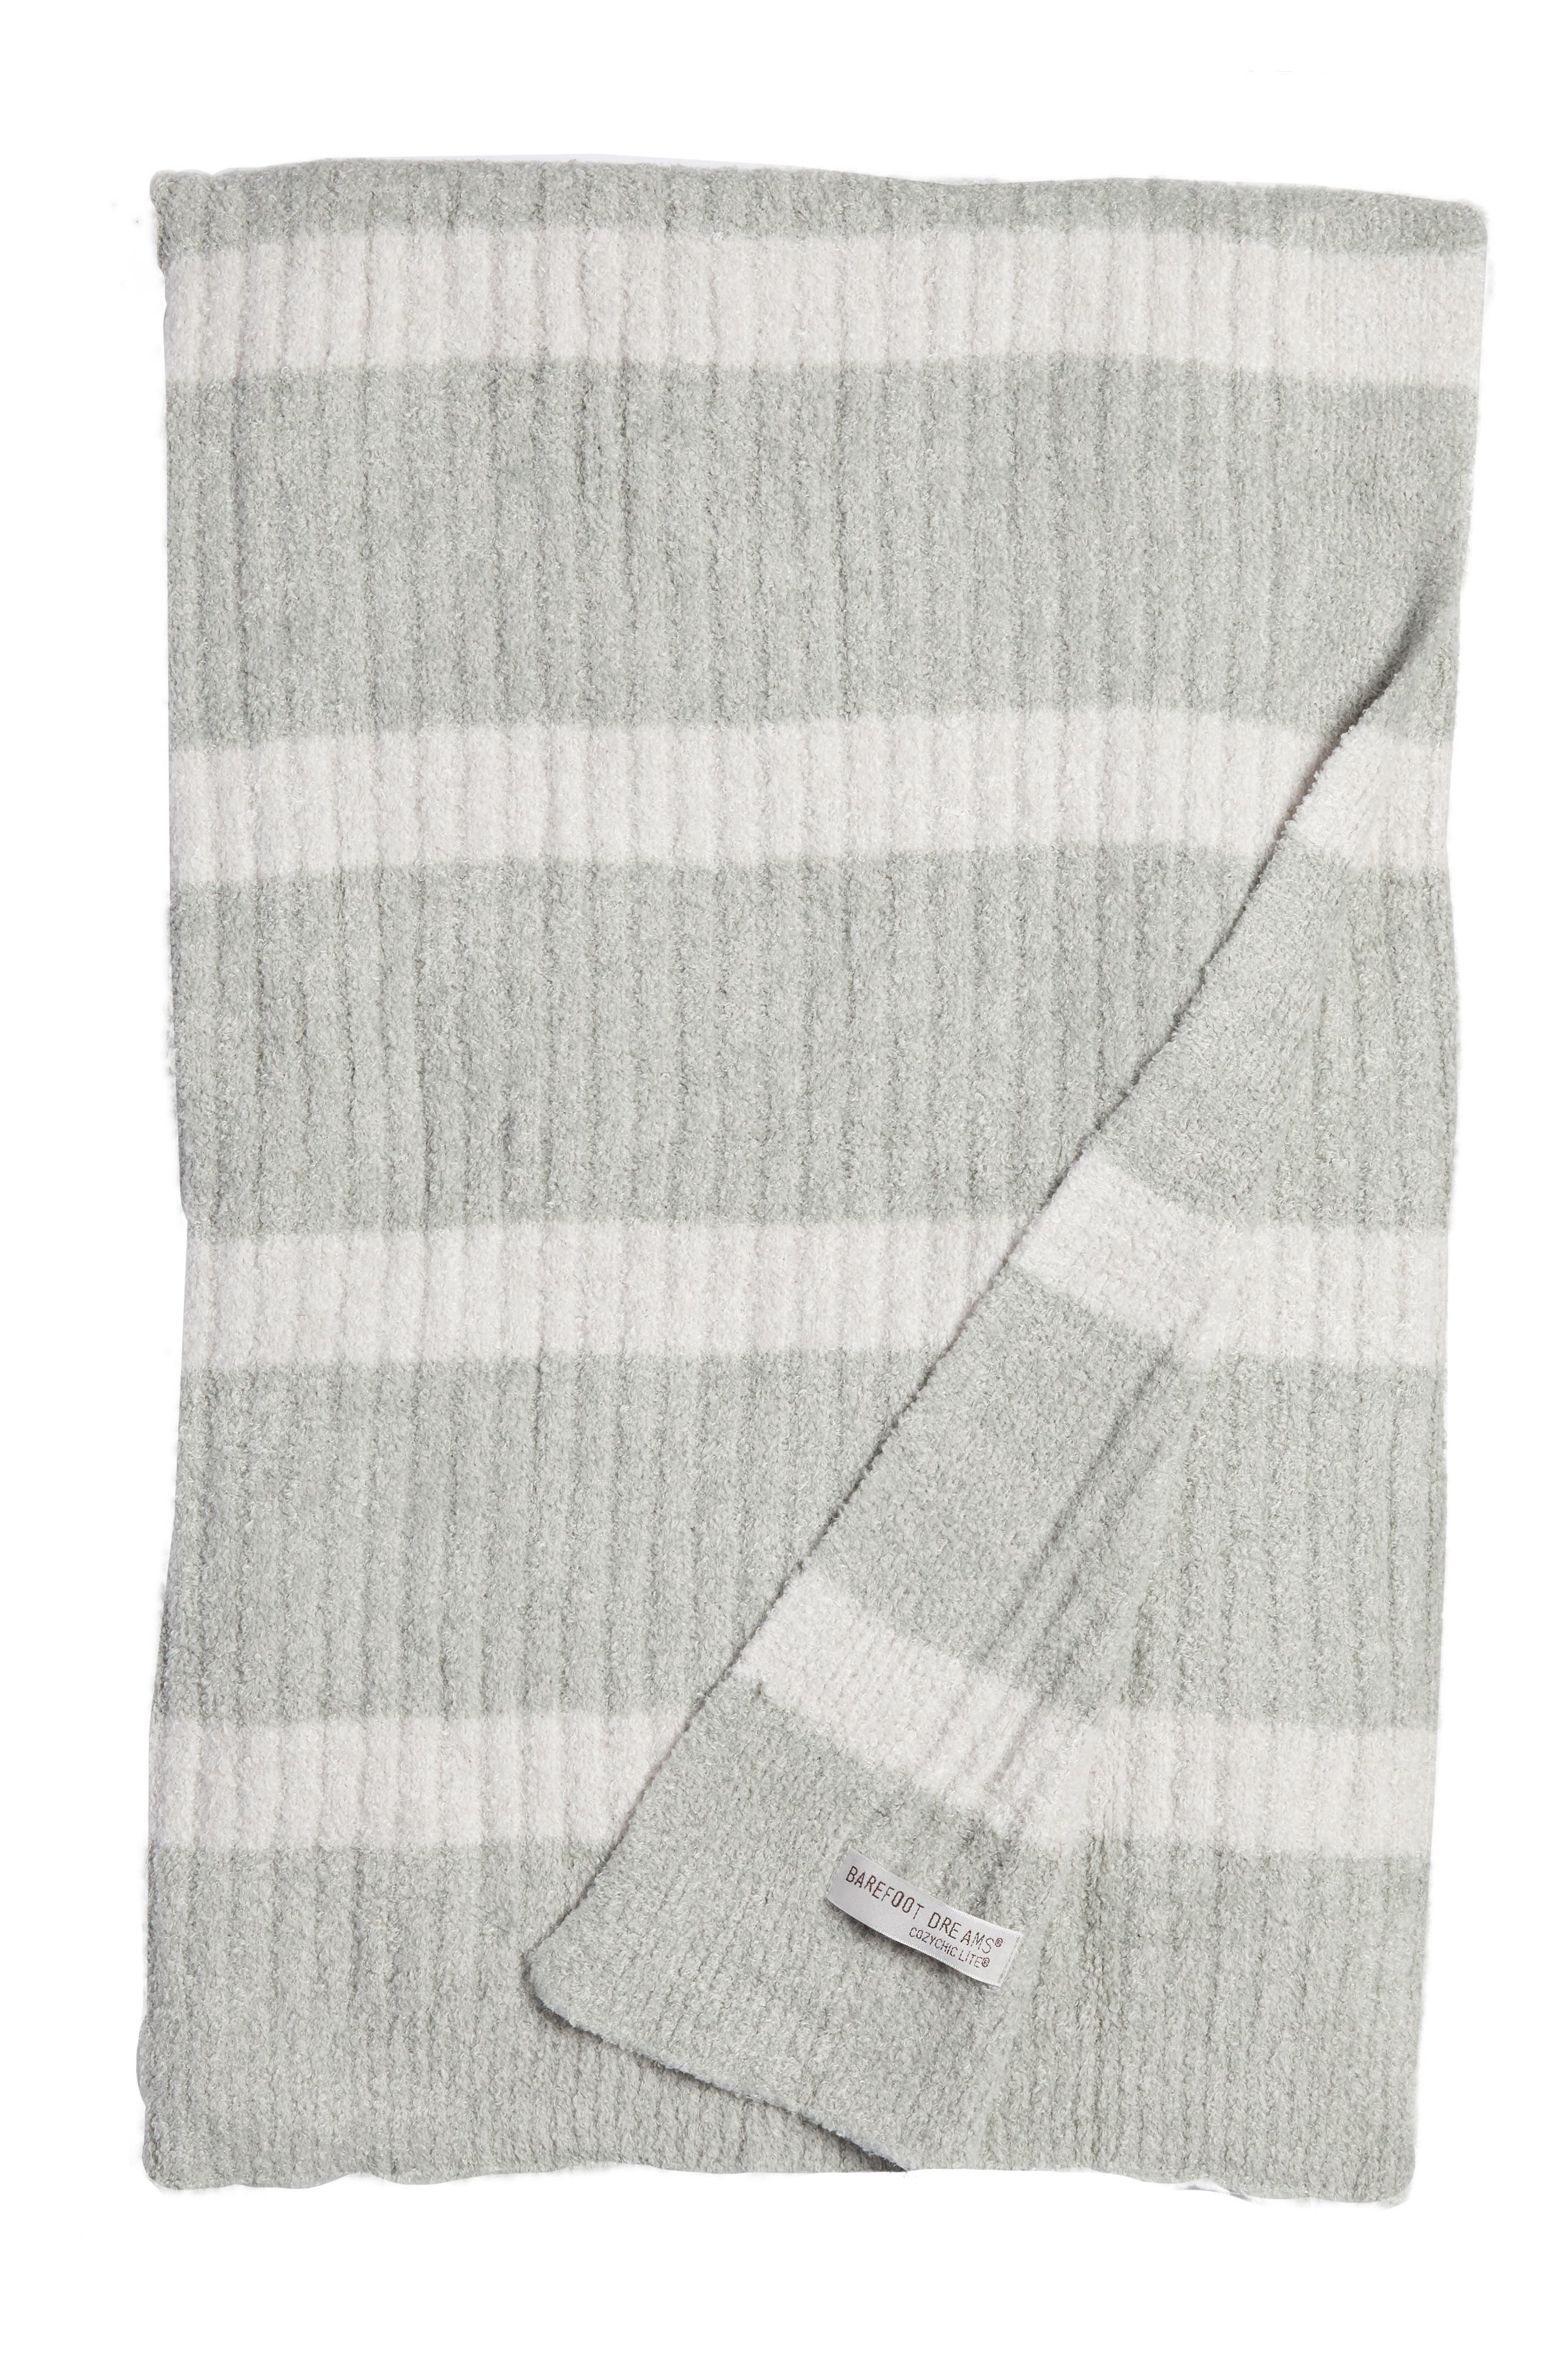 CozyChic Lite<sup>®</sup> Stripe Throw Blanket,                             Main thumbnail 1, color,                             SEAFOAM GREEN-PEARL COMBO